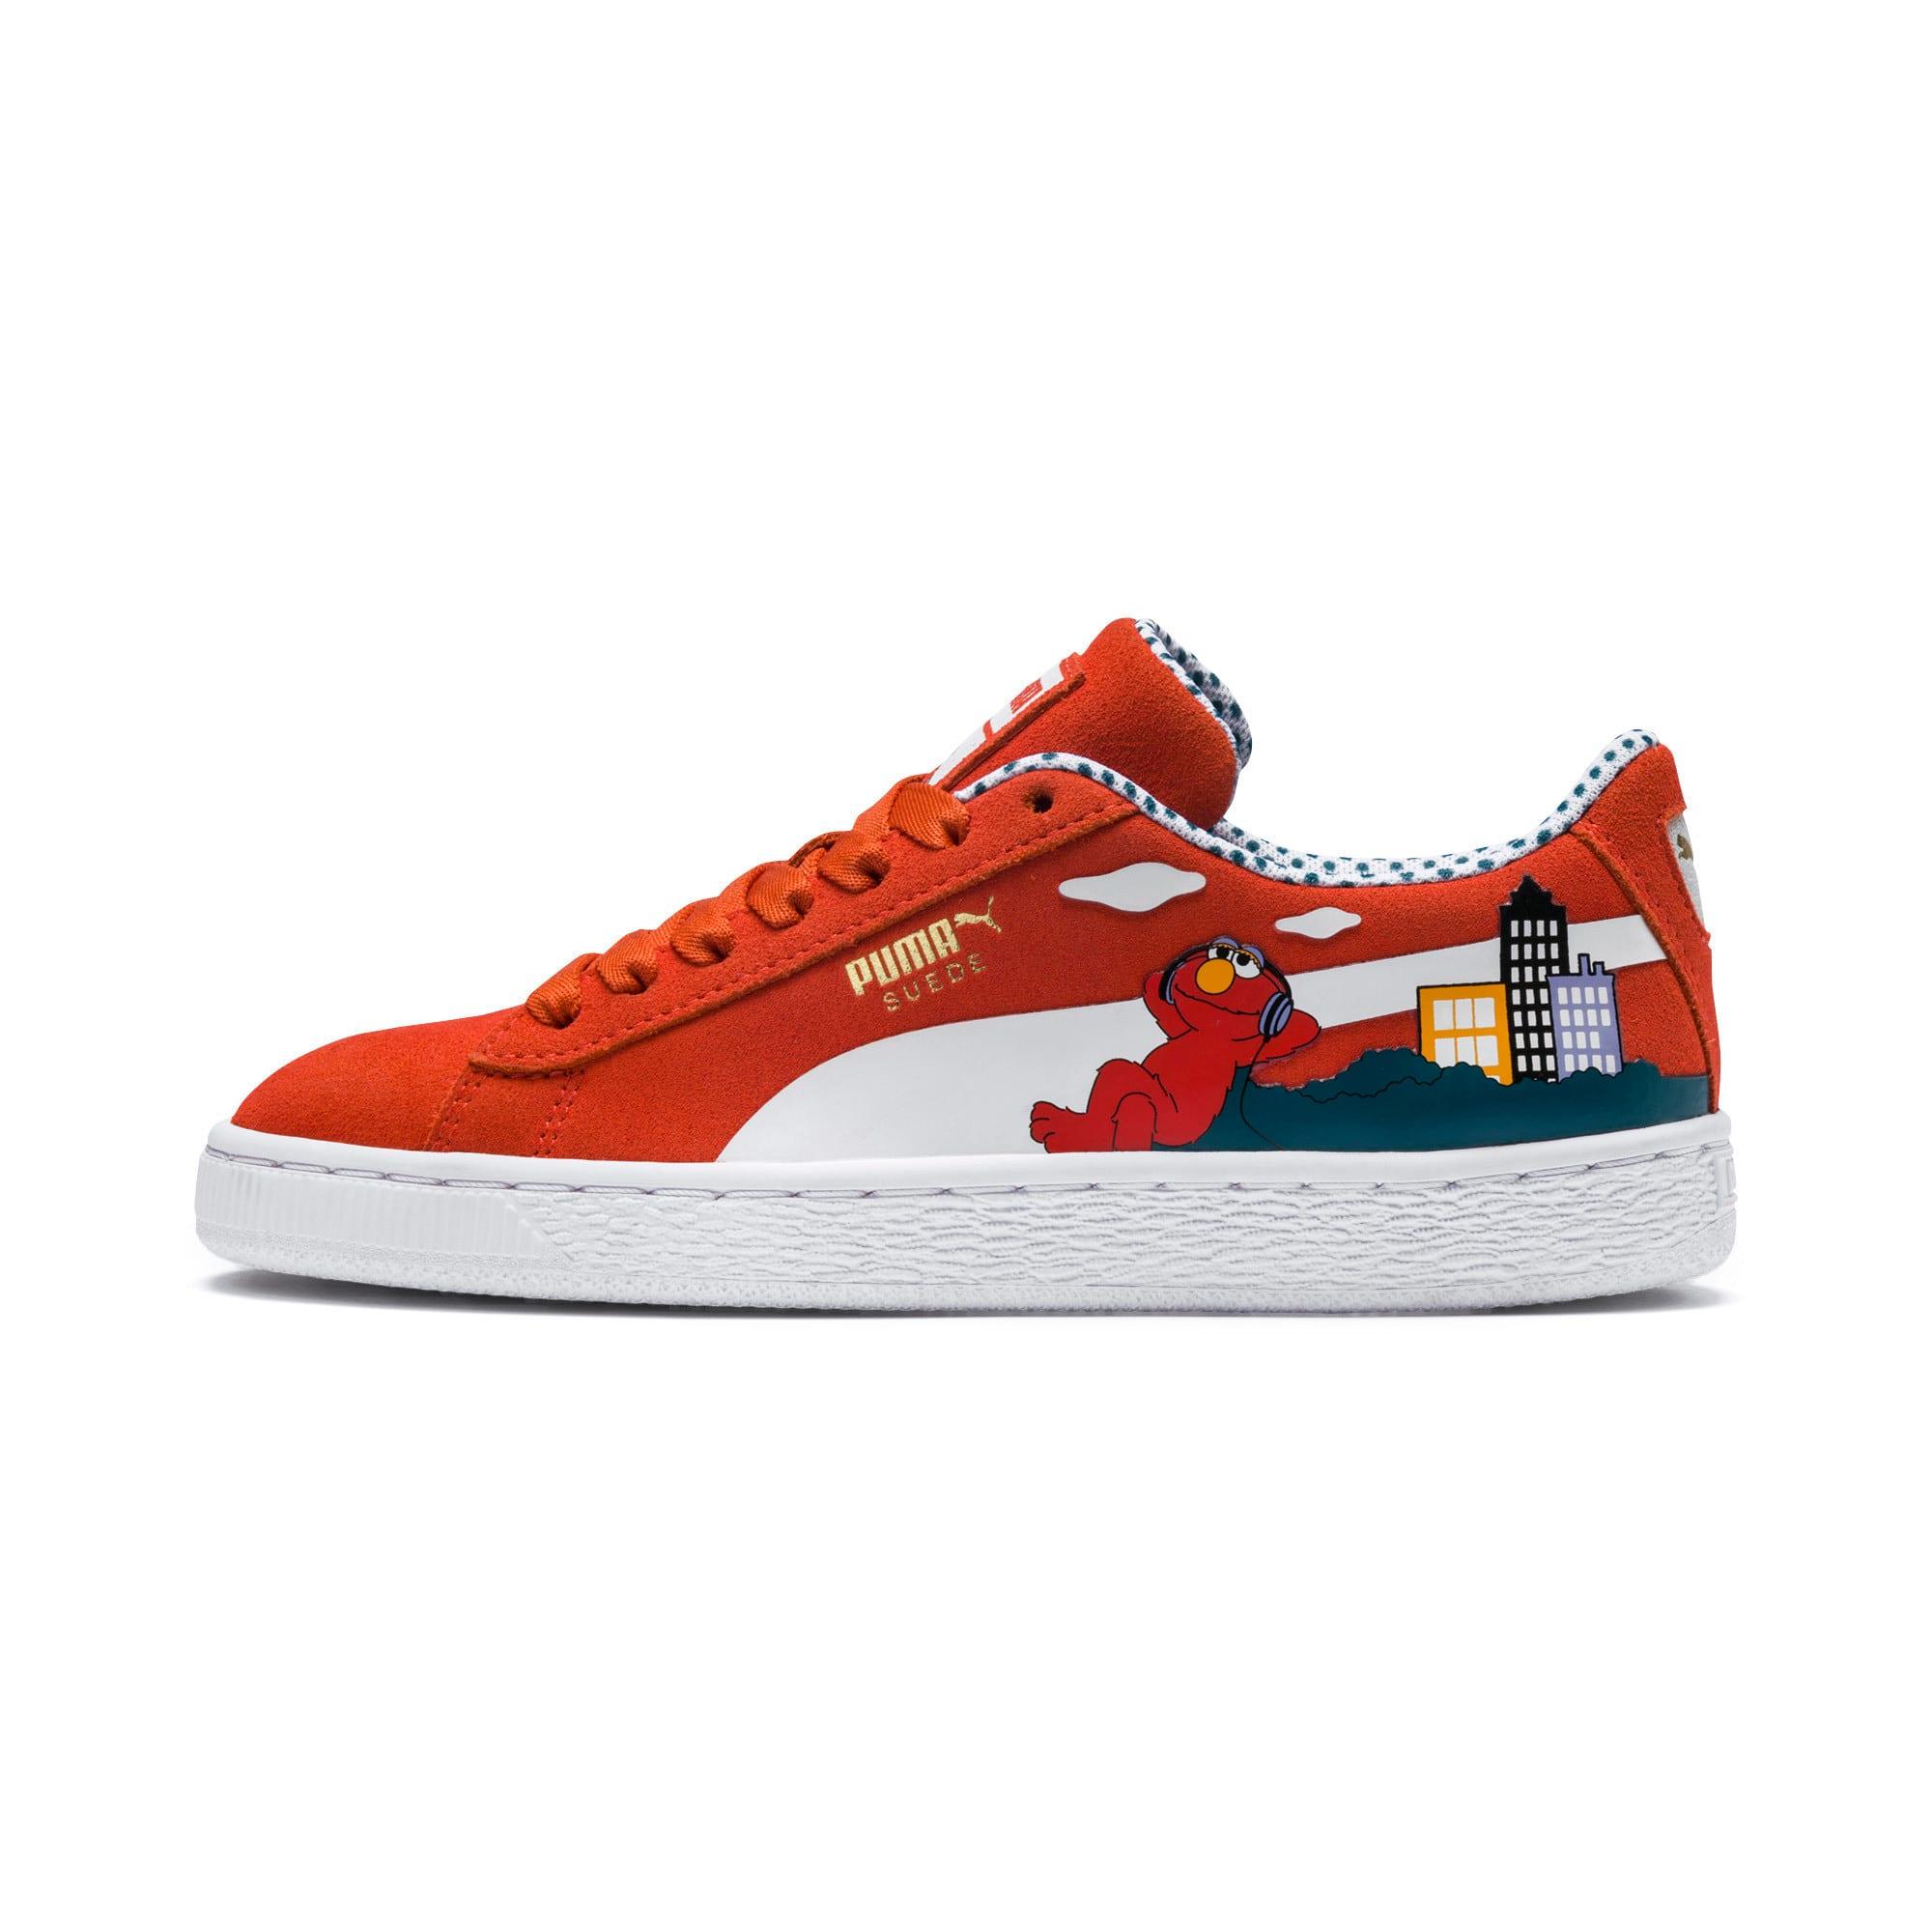 Thumbnail 1 of Sesame Street 50 Suede Sneakers JR, Cherry Tomato-Puma White, medium